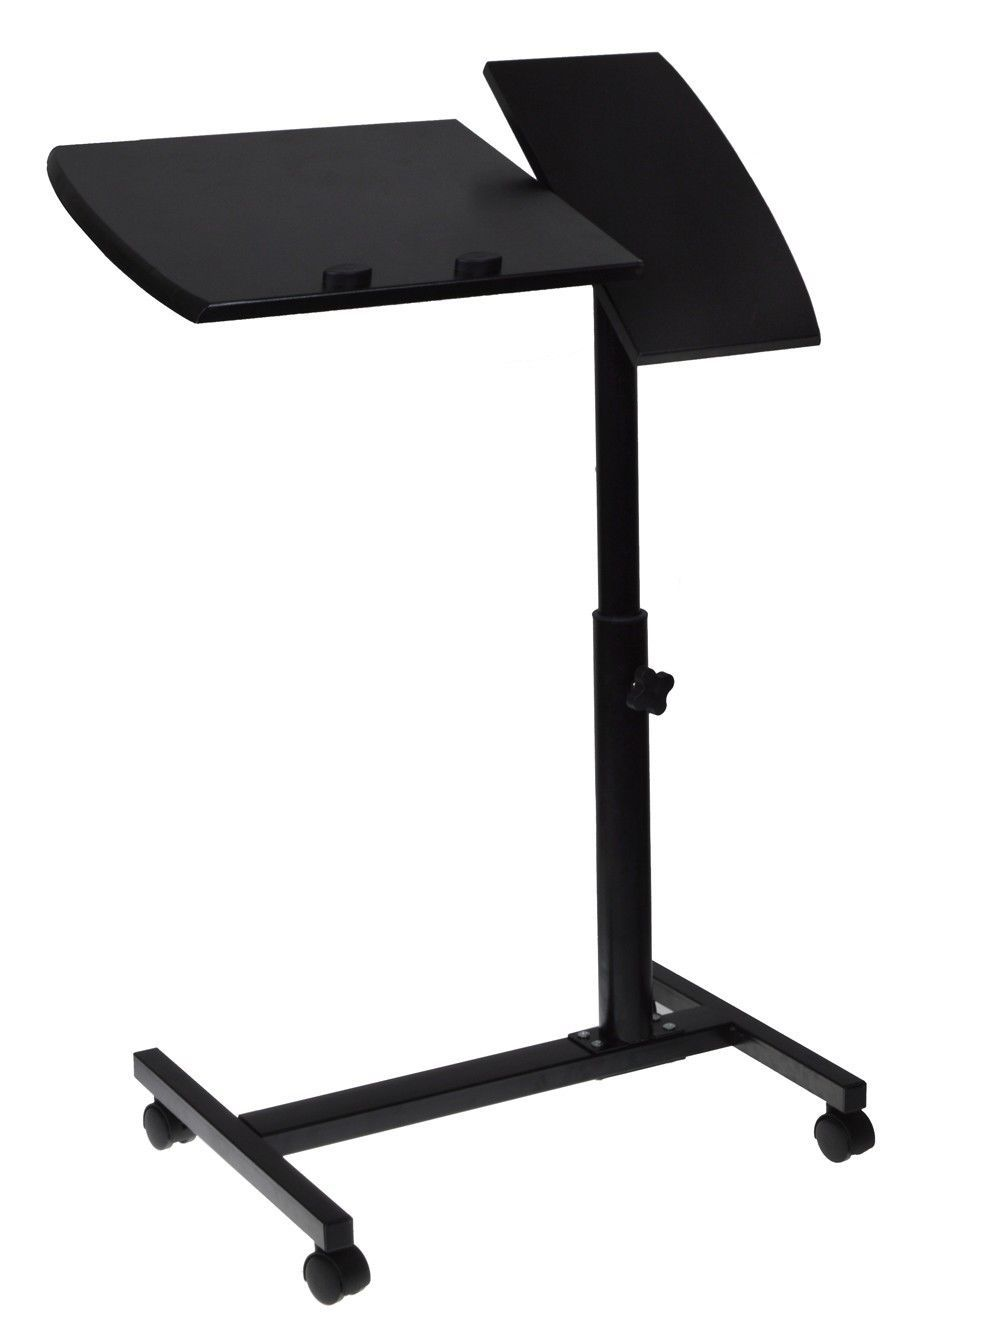 Portable Standing Desk Attachment Portable Standing Desk